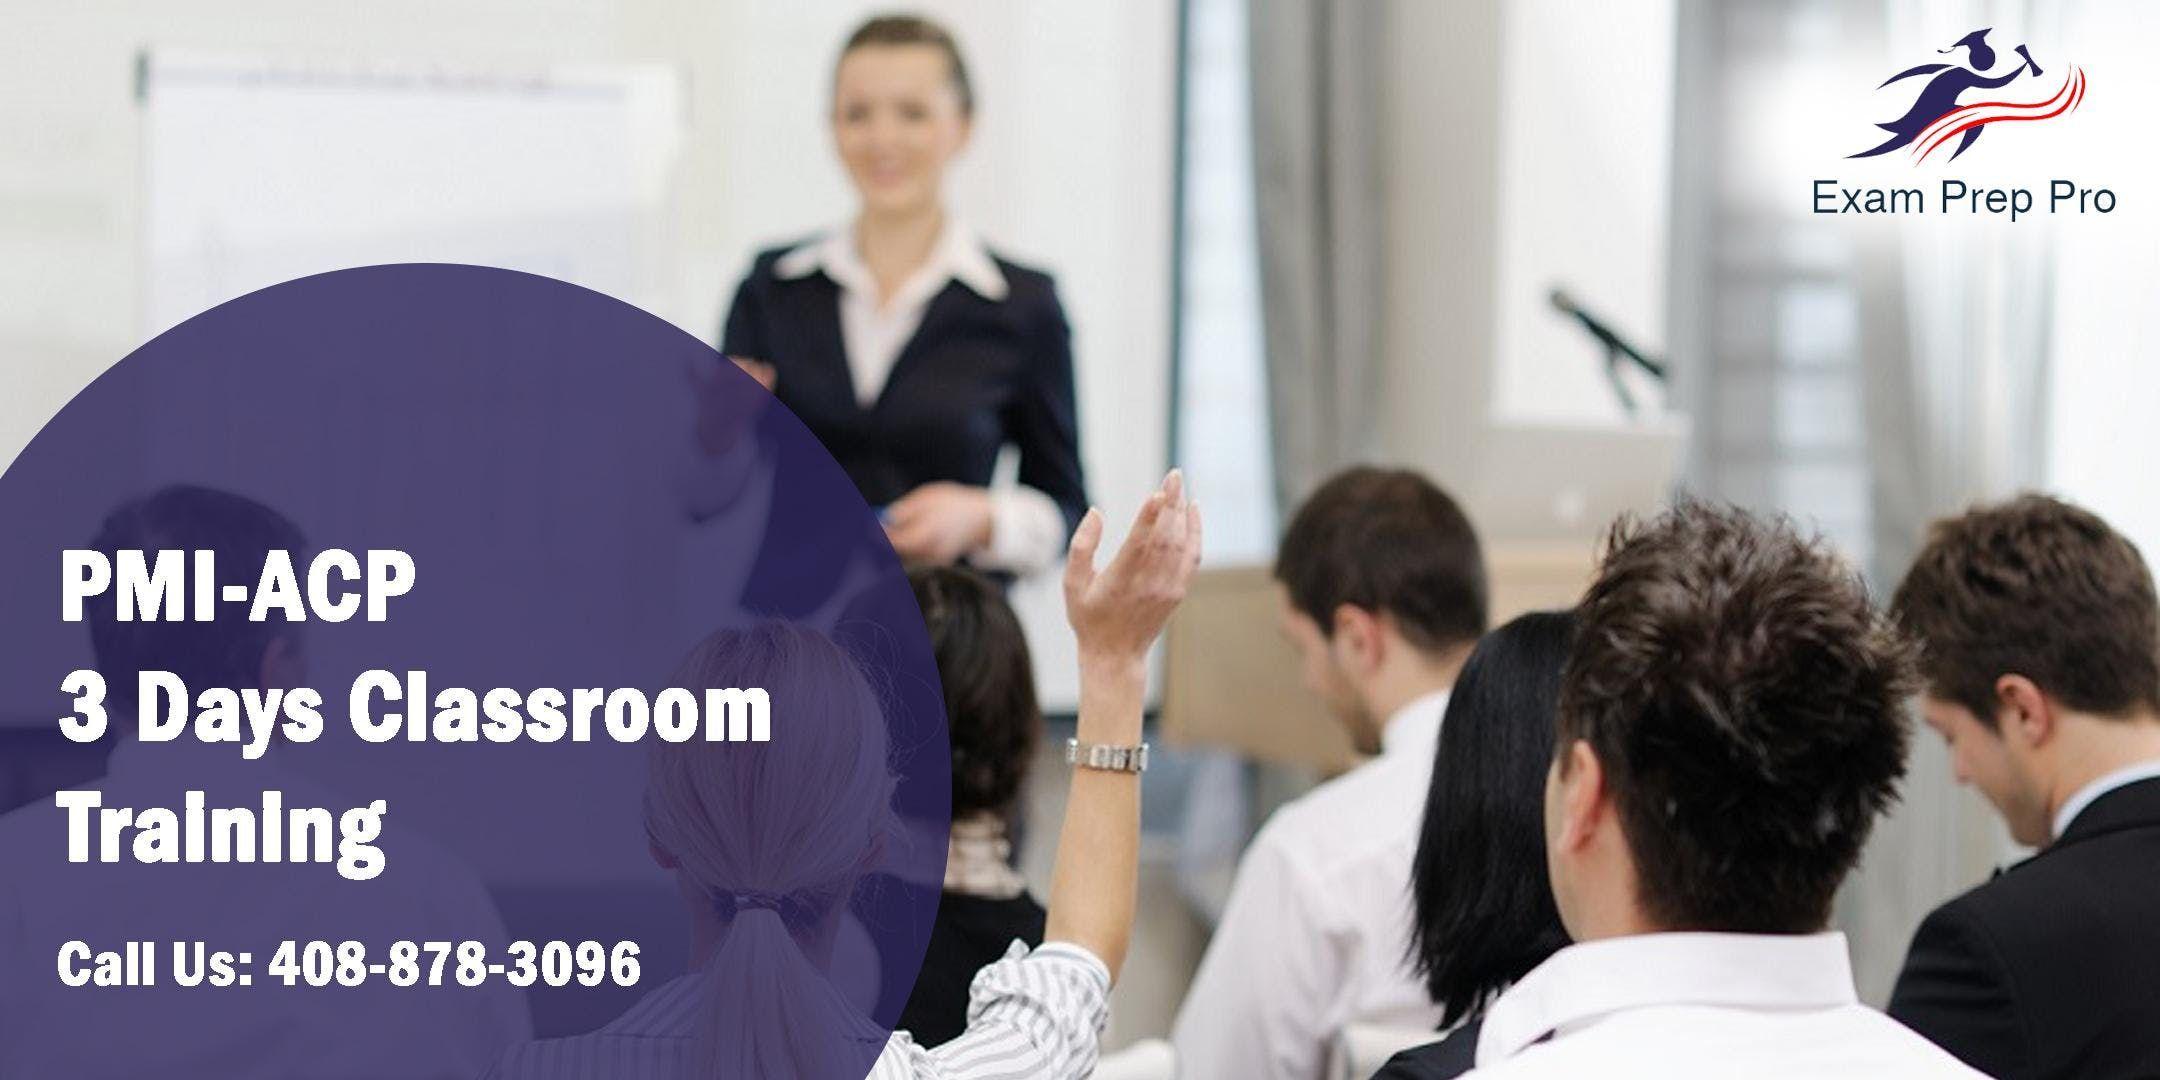 PMI-ACP 3 Days Classroom Training in ColumbiaSC